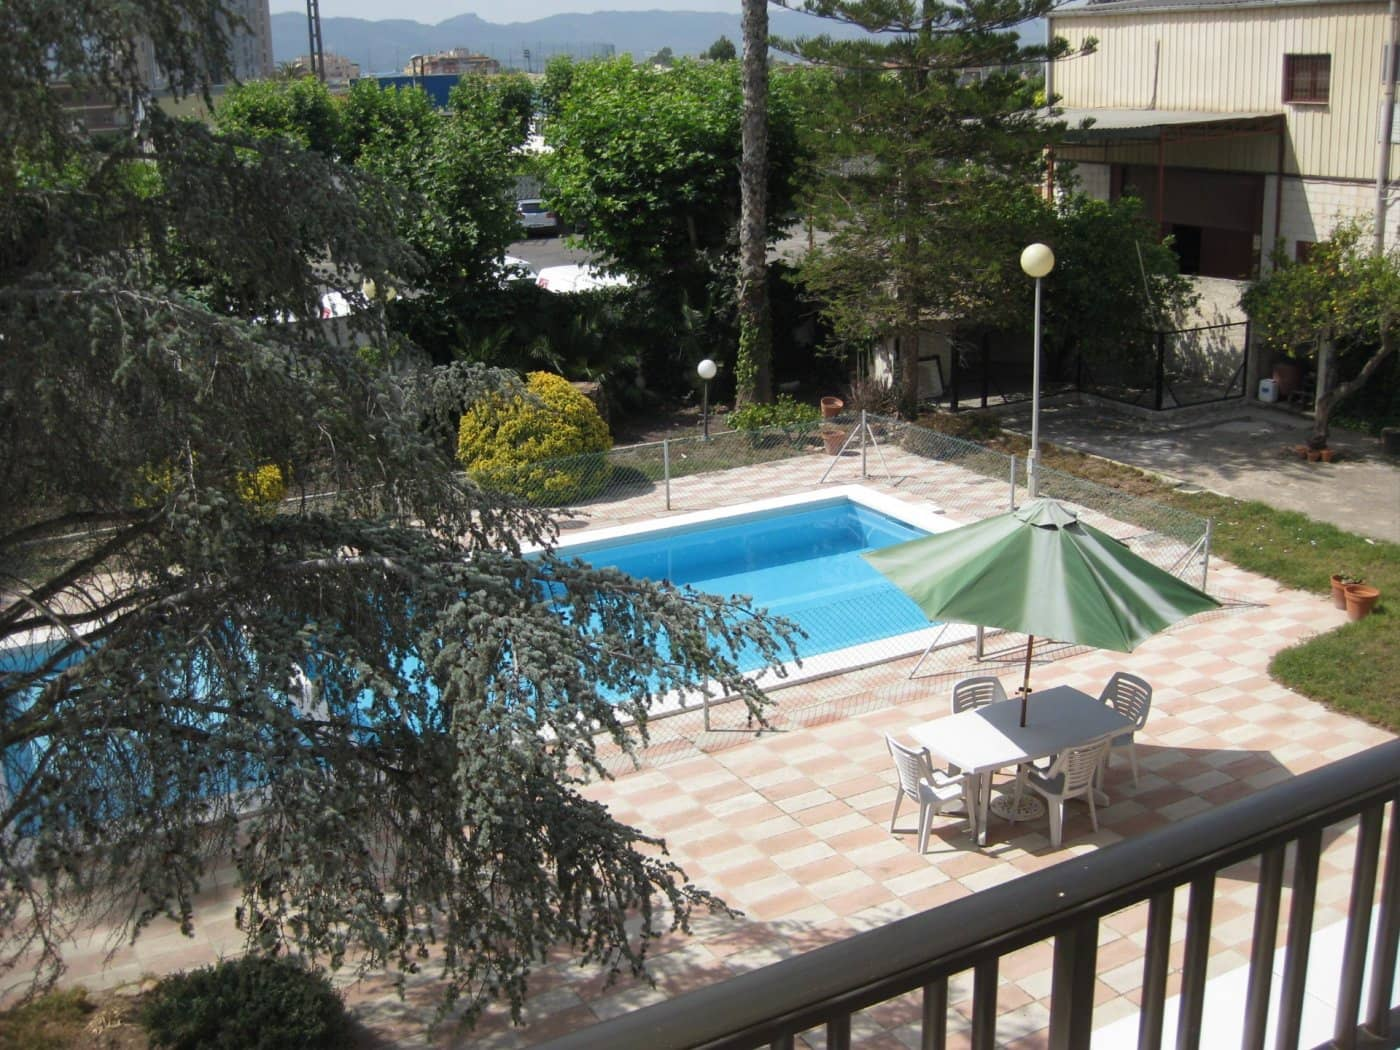 7 chambre Finca/Maison de Campagne à vendre à Espinardo avec piscine garage - 380 000 € (Ref: 4522009)